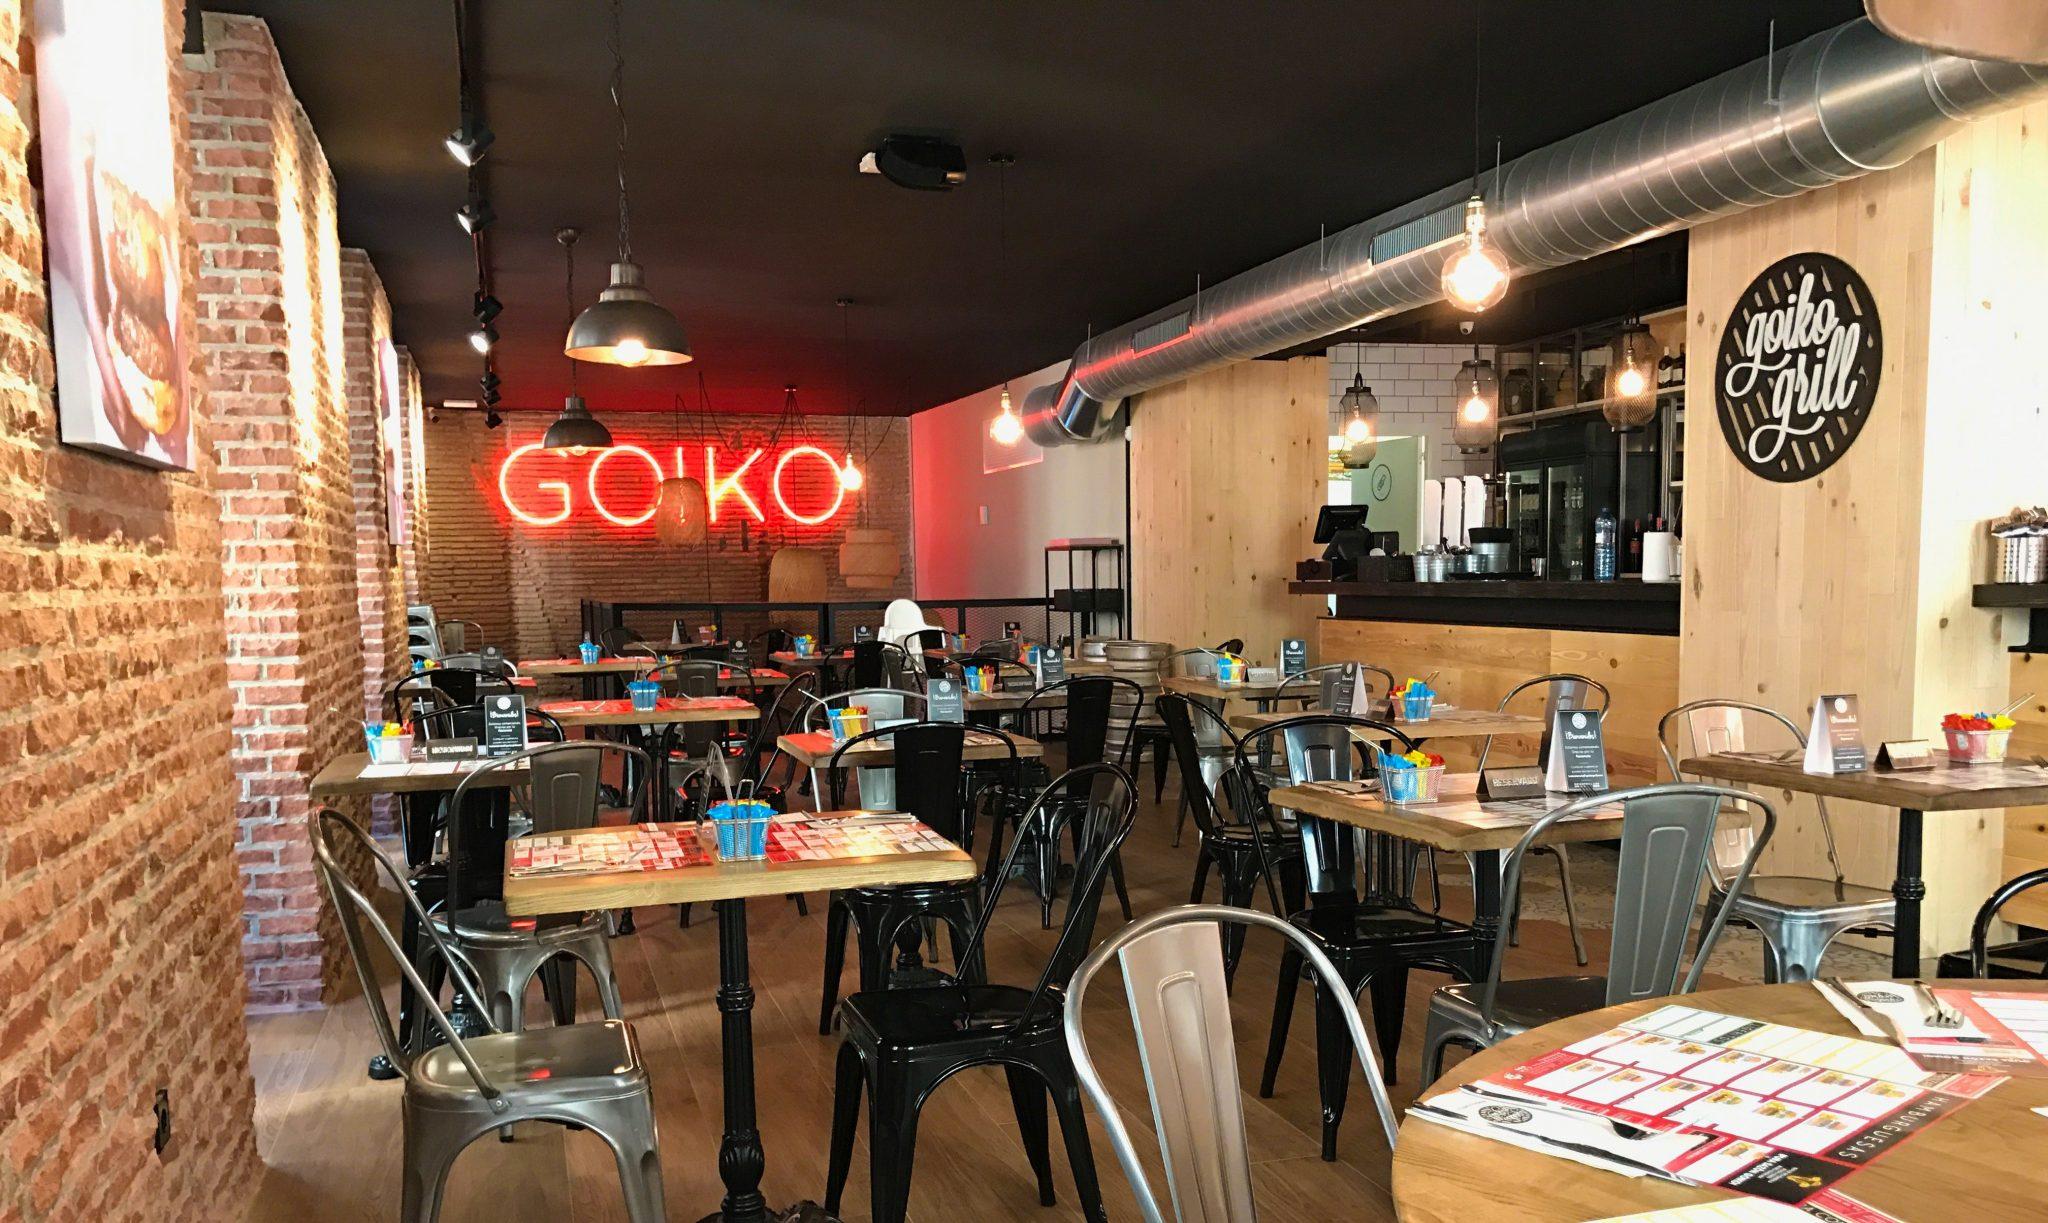 Goiko Grill, Μαδρίτη, Ισπανία, Ευρώπη